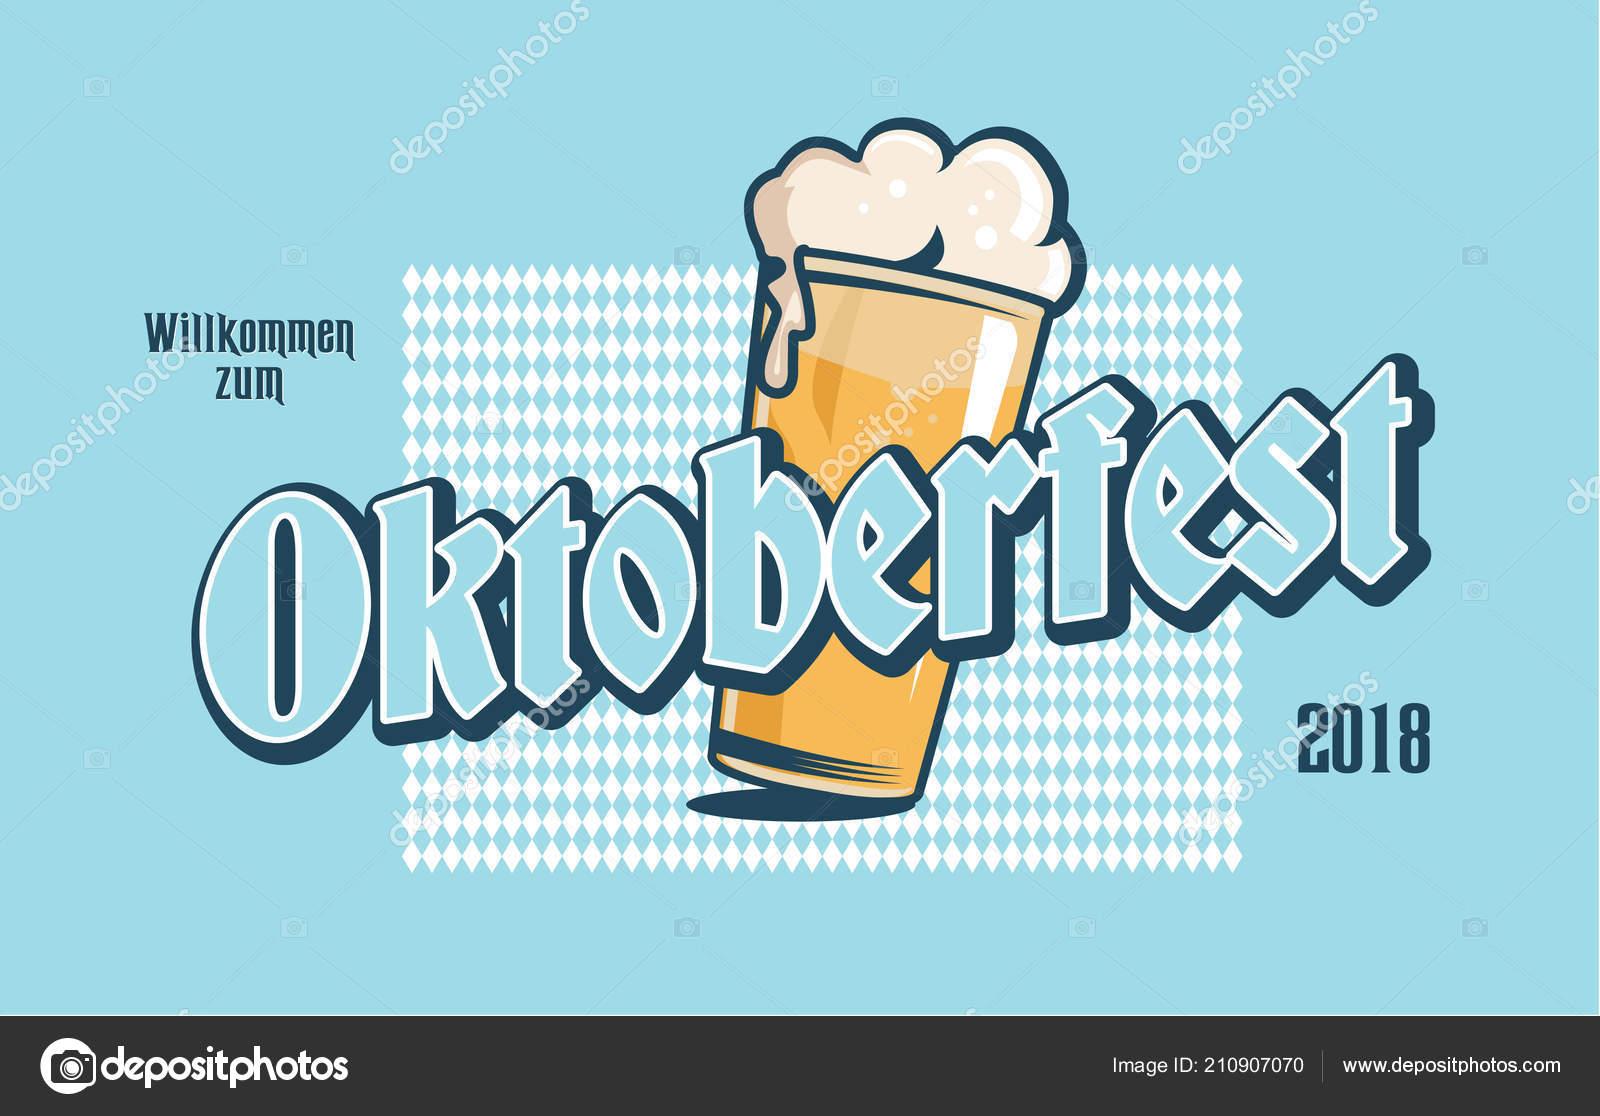 Oktoberfest Label Oktoberfest Typography Logo Greeting Cards Banners